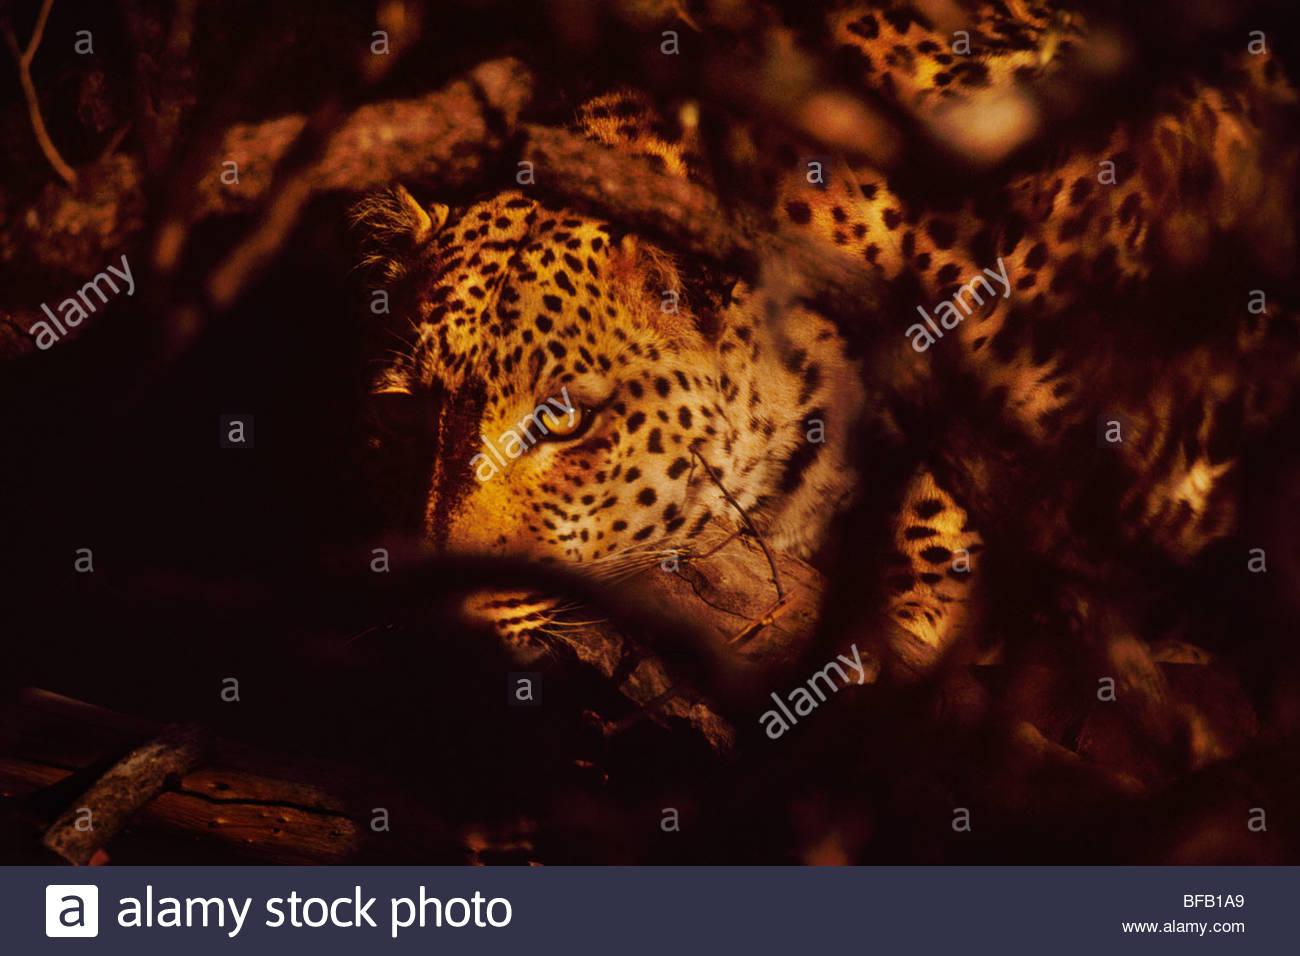 Leopard in dense bush, Panthera pardus, Namibia - Stock Image